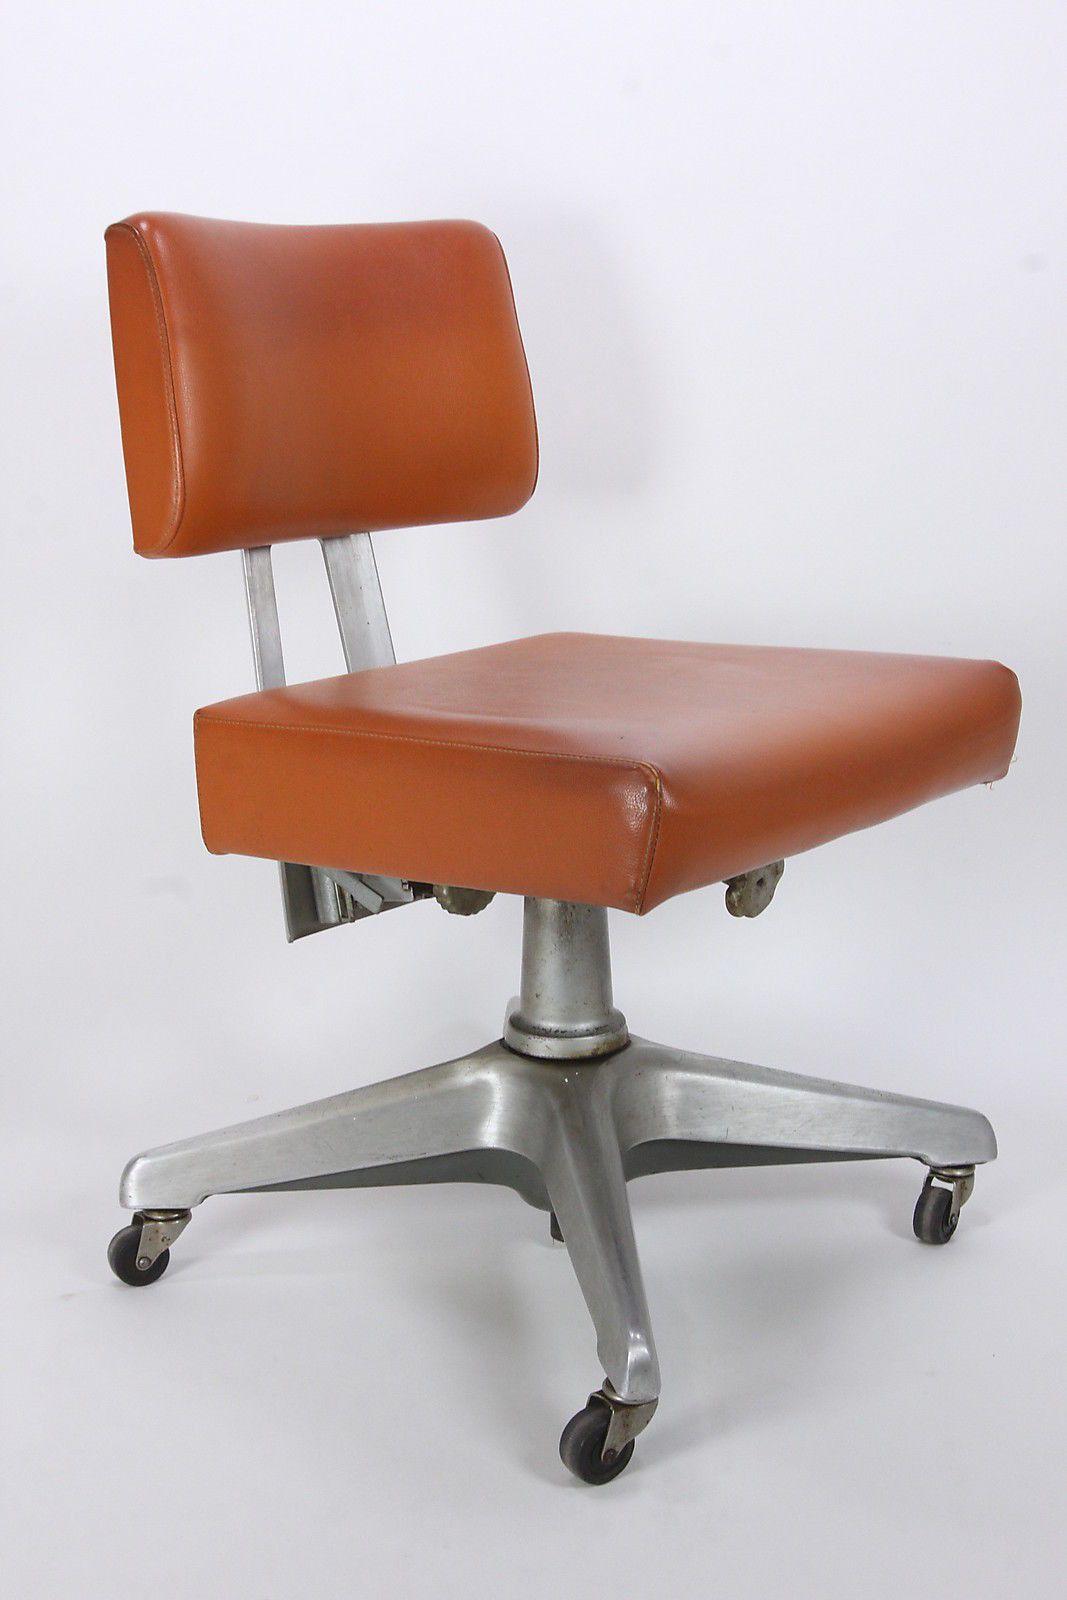 good form mid century modern adjustable orange office chair aluminum 31 43